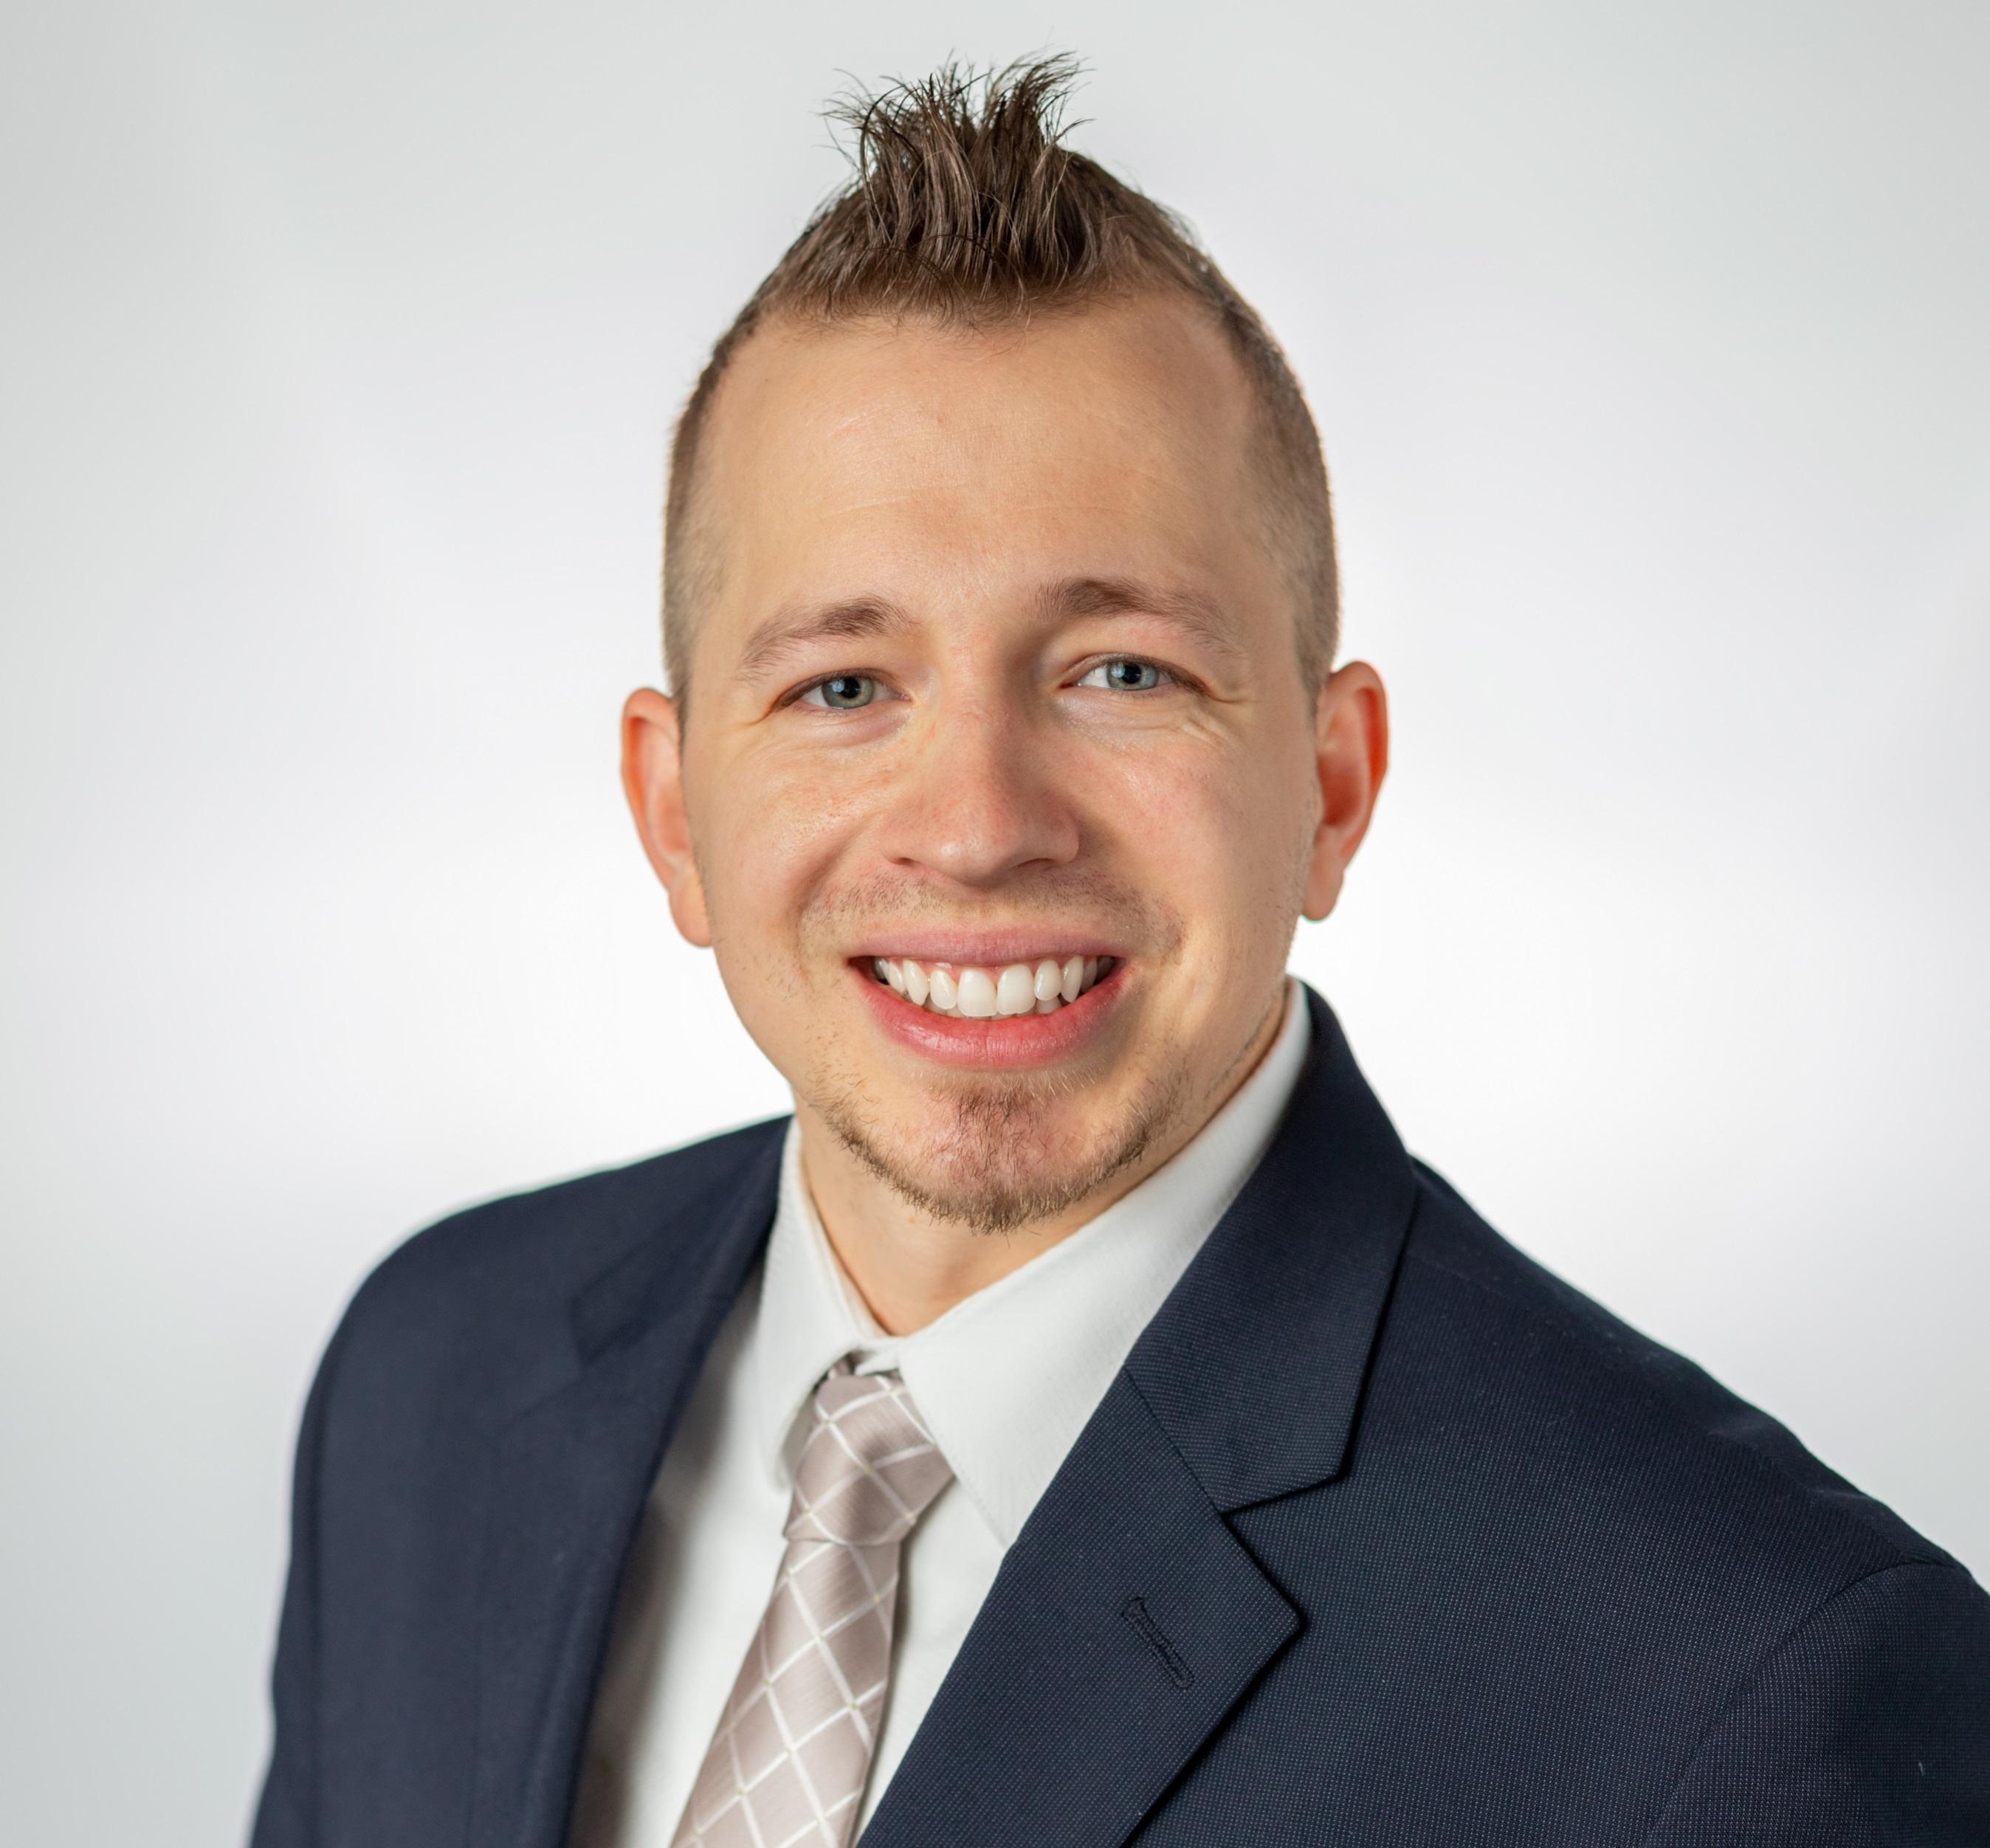 JARROD HODGES Your Financial Professional & Insurance Agent